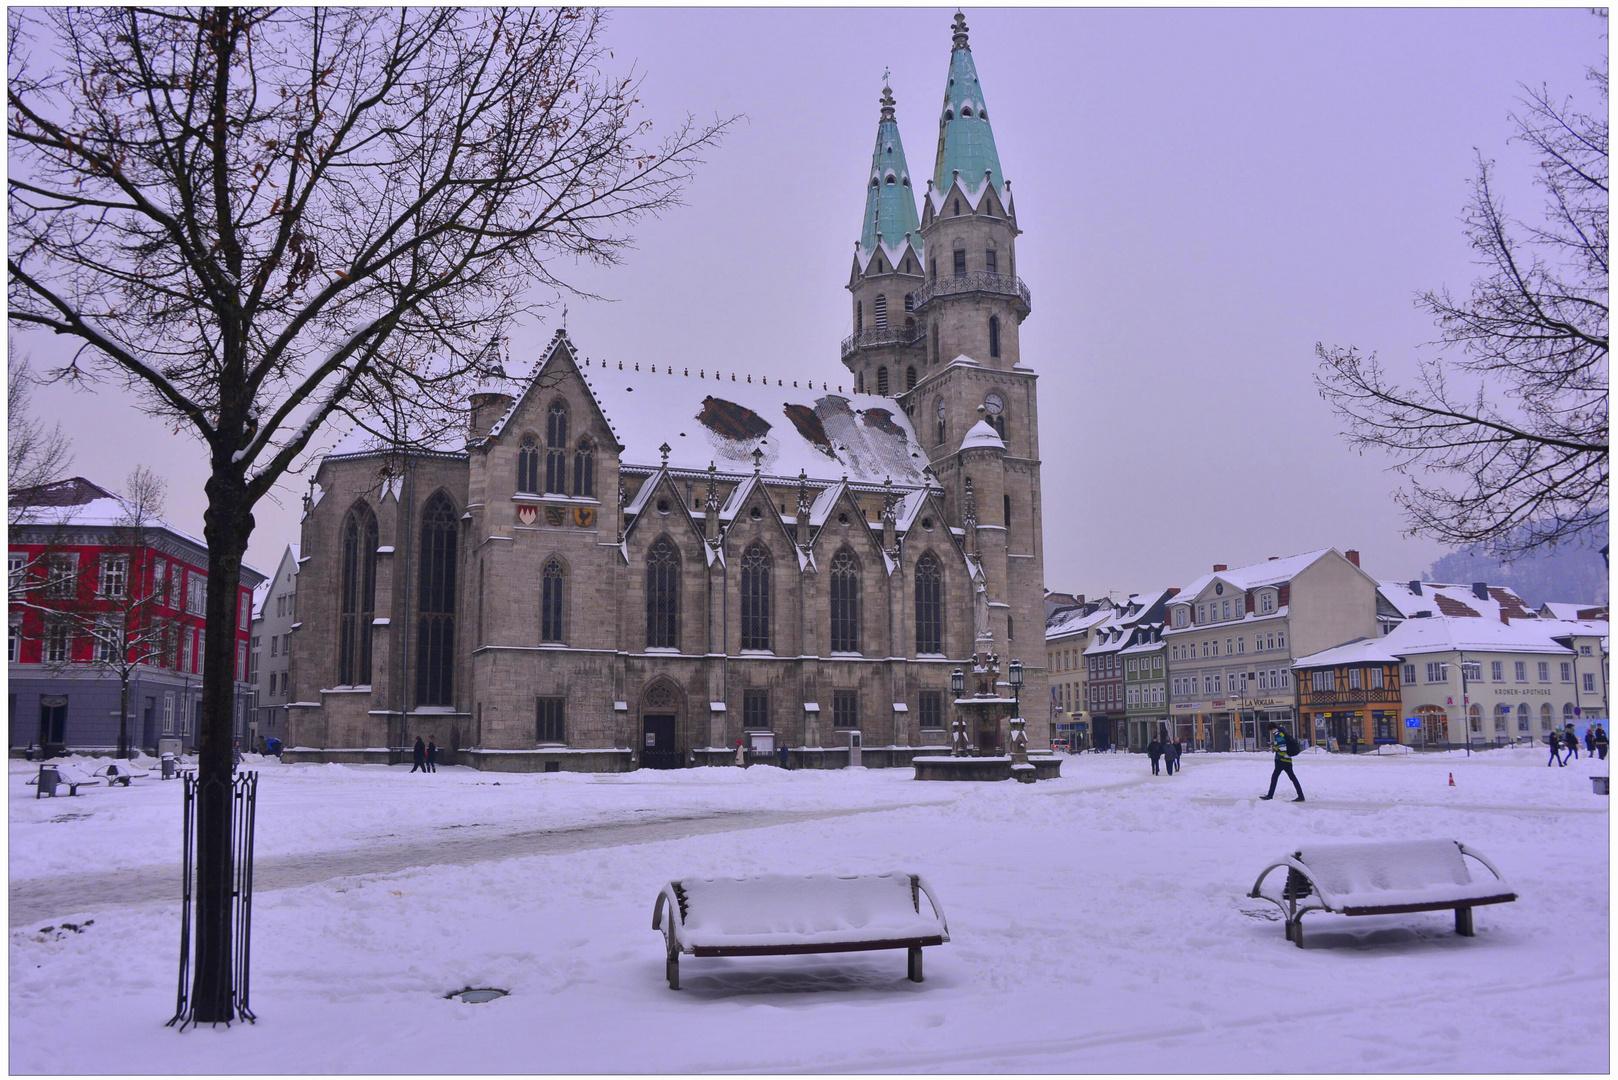 Meiningen, winterliche Impressionen III (sensacón invernal III)